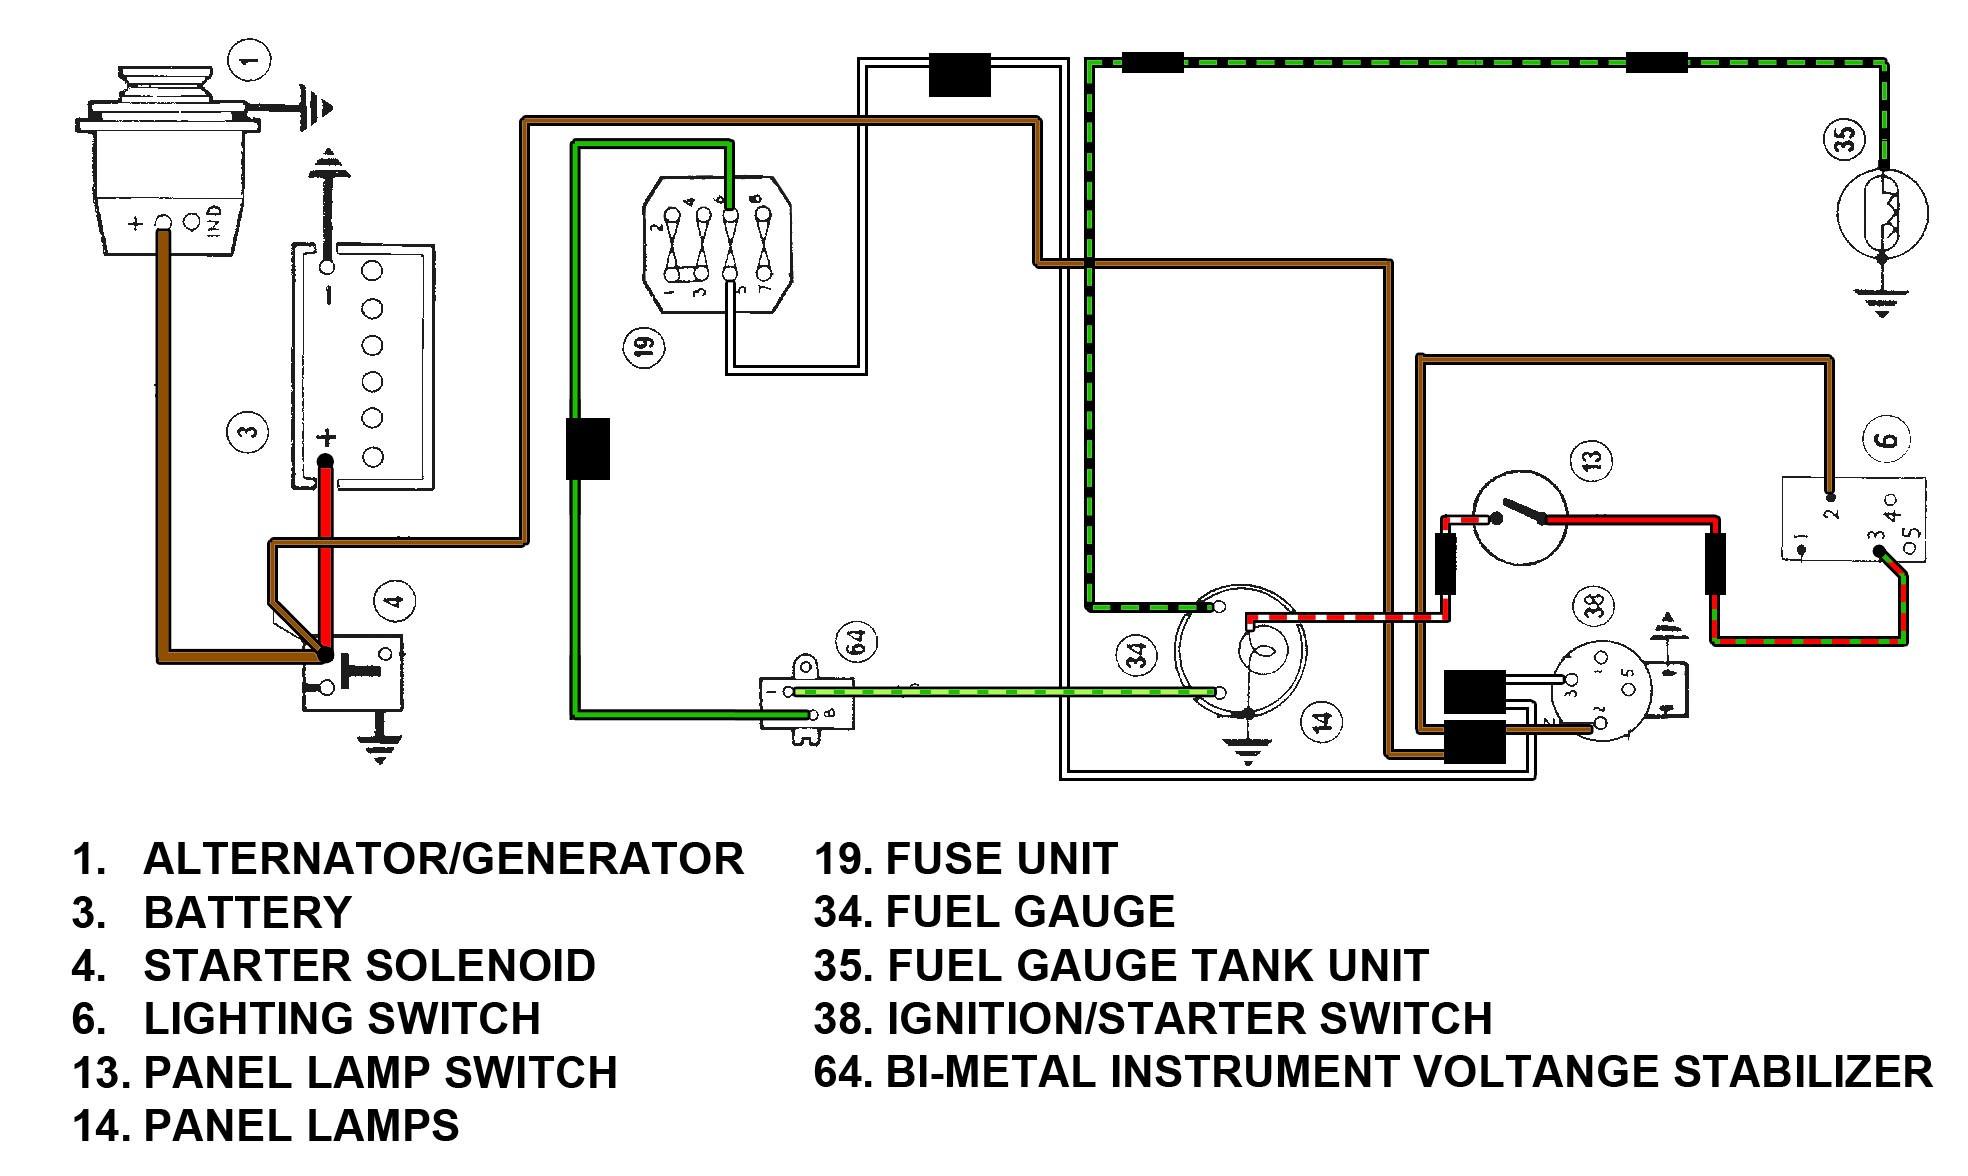 hight resolution of vdo cht gauge wiring diagram everything wiring diagram vdo cht gauge wiring diagram